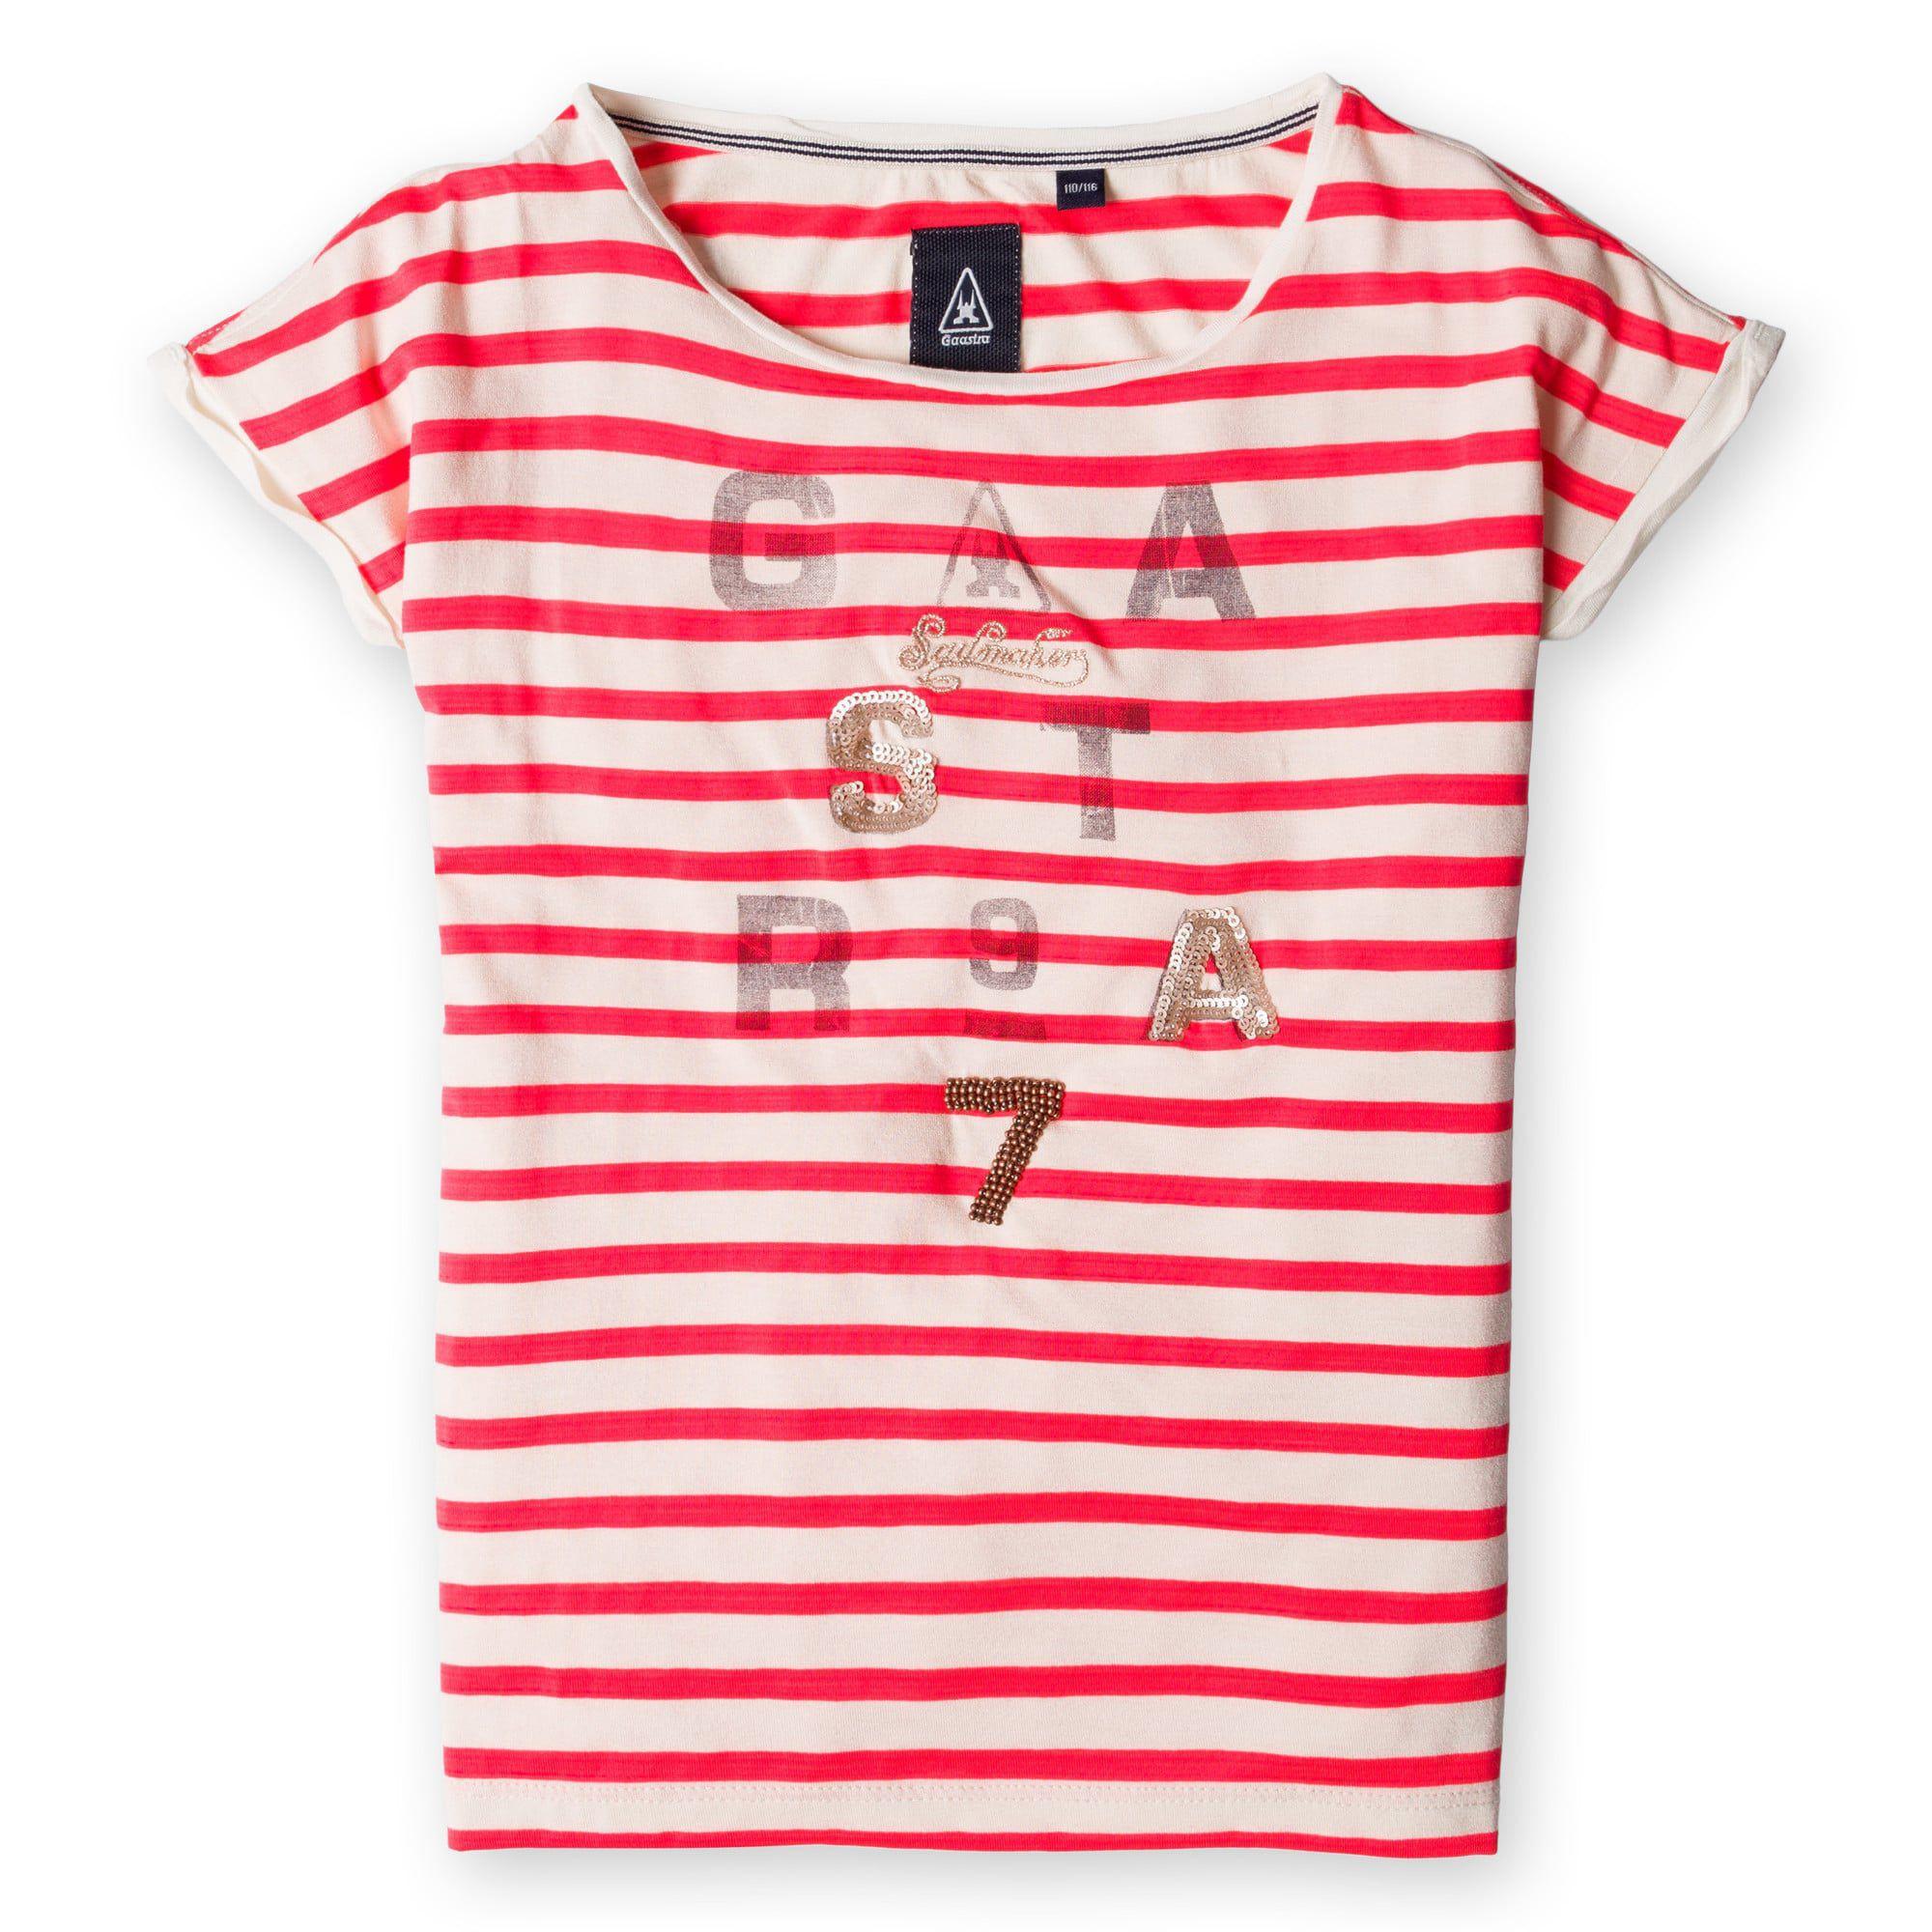 Gaastra Vanish Girls T-Shirt